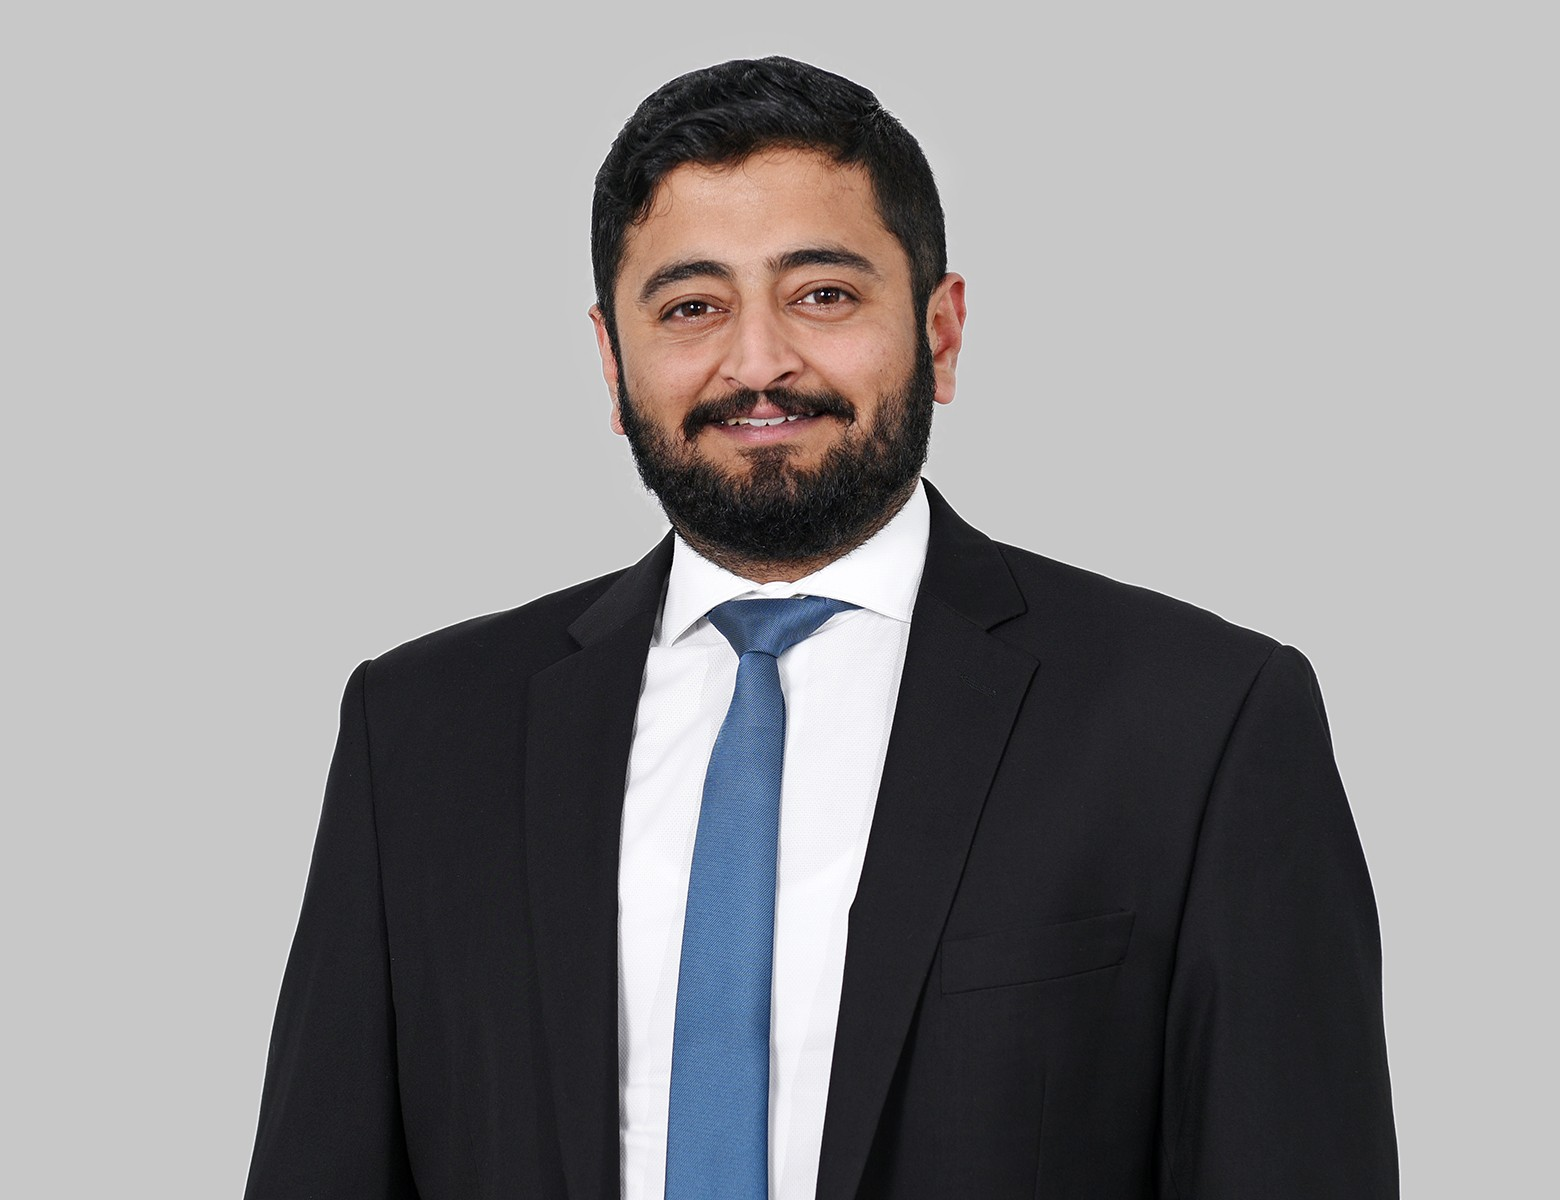 Syed Wajih Uddin Ahmed